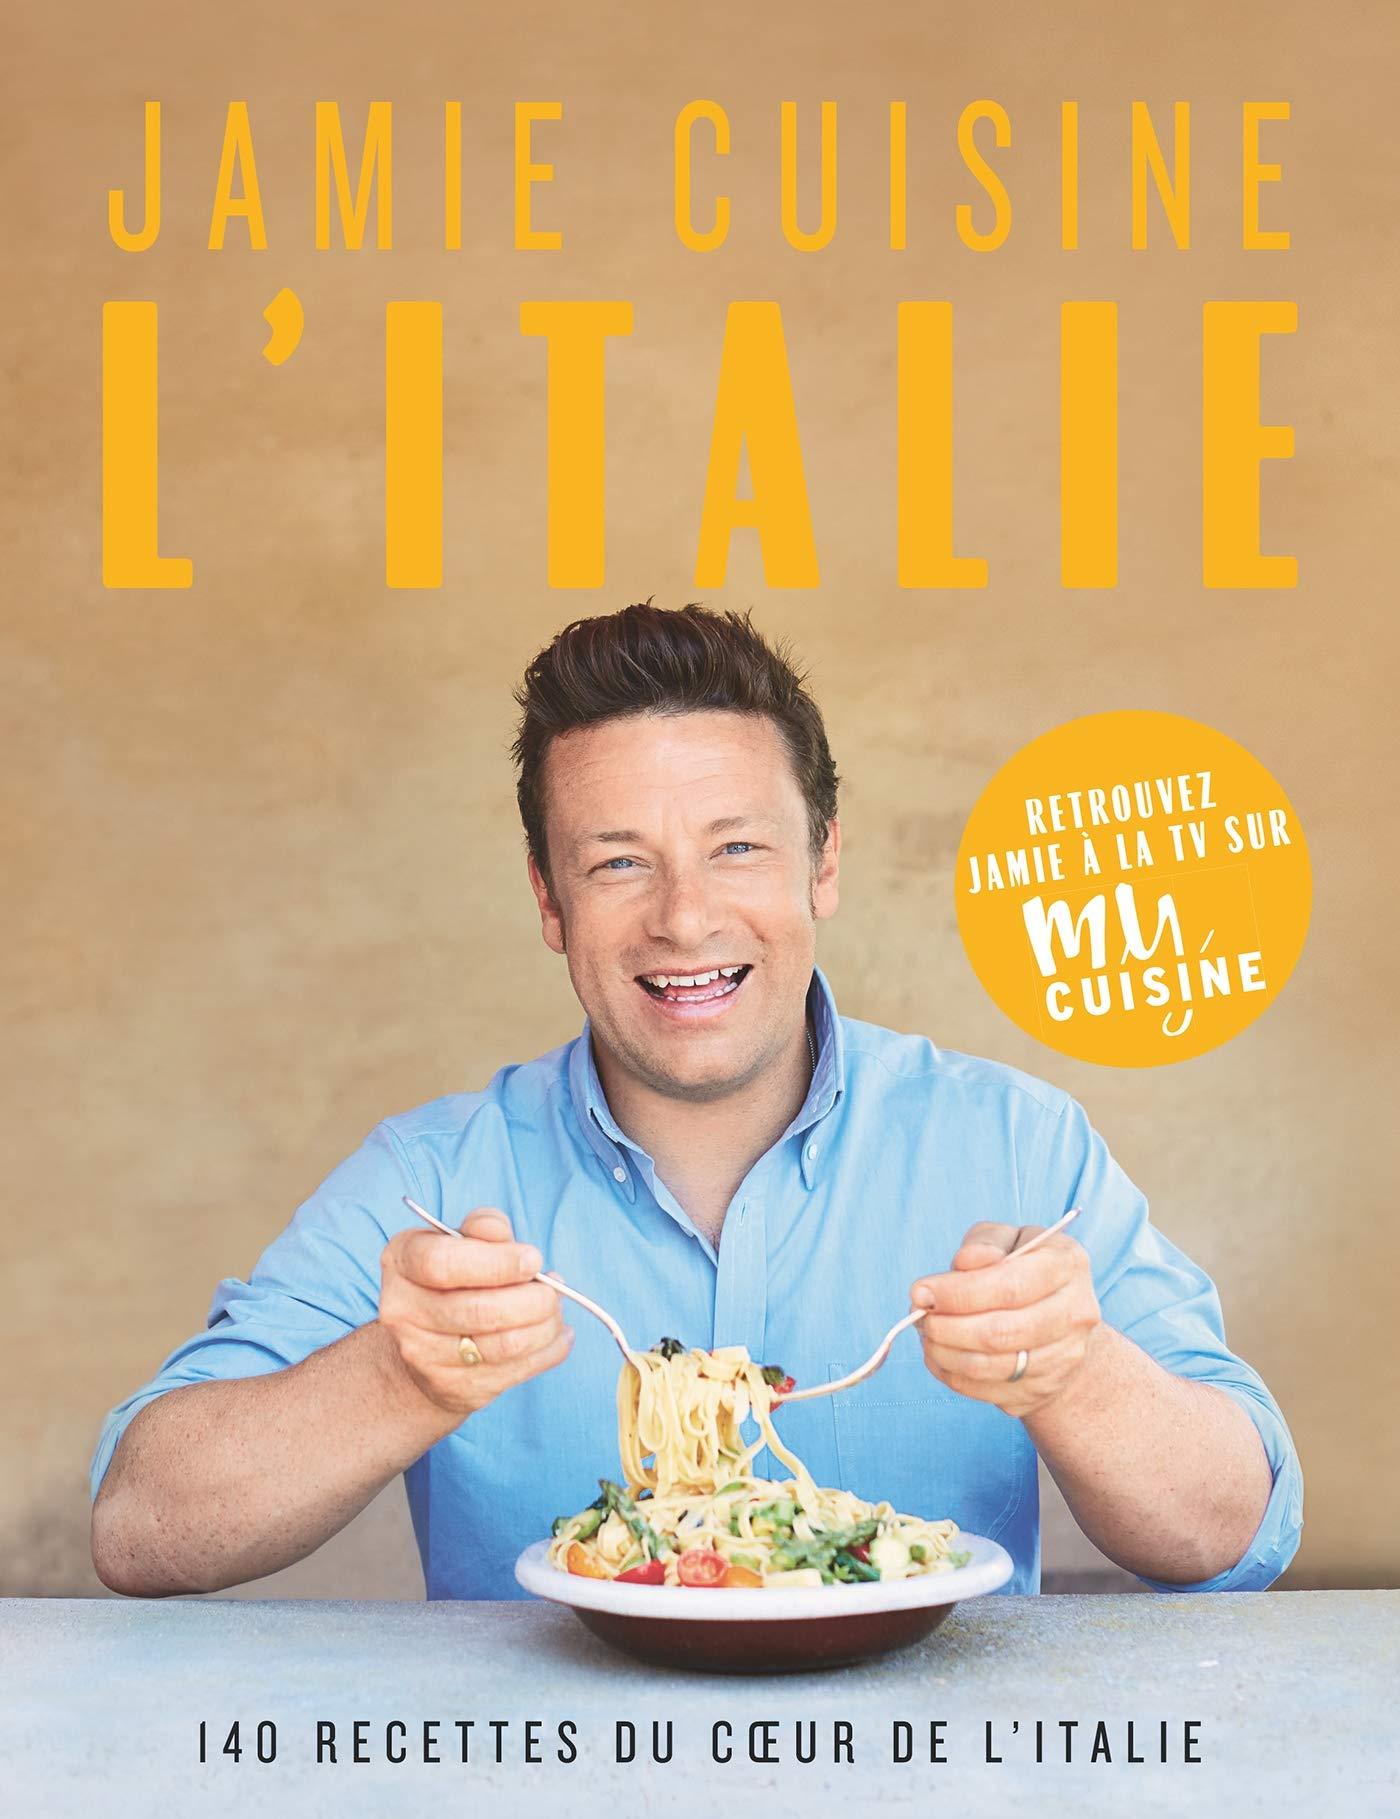 Jamie Cuisine Litalie